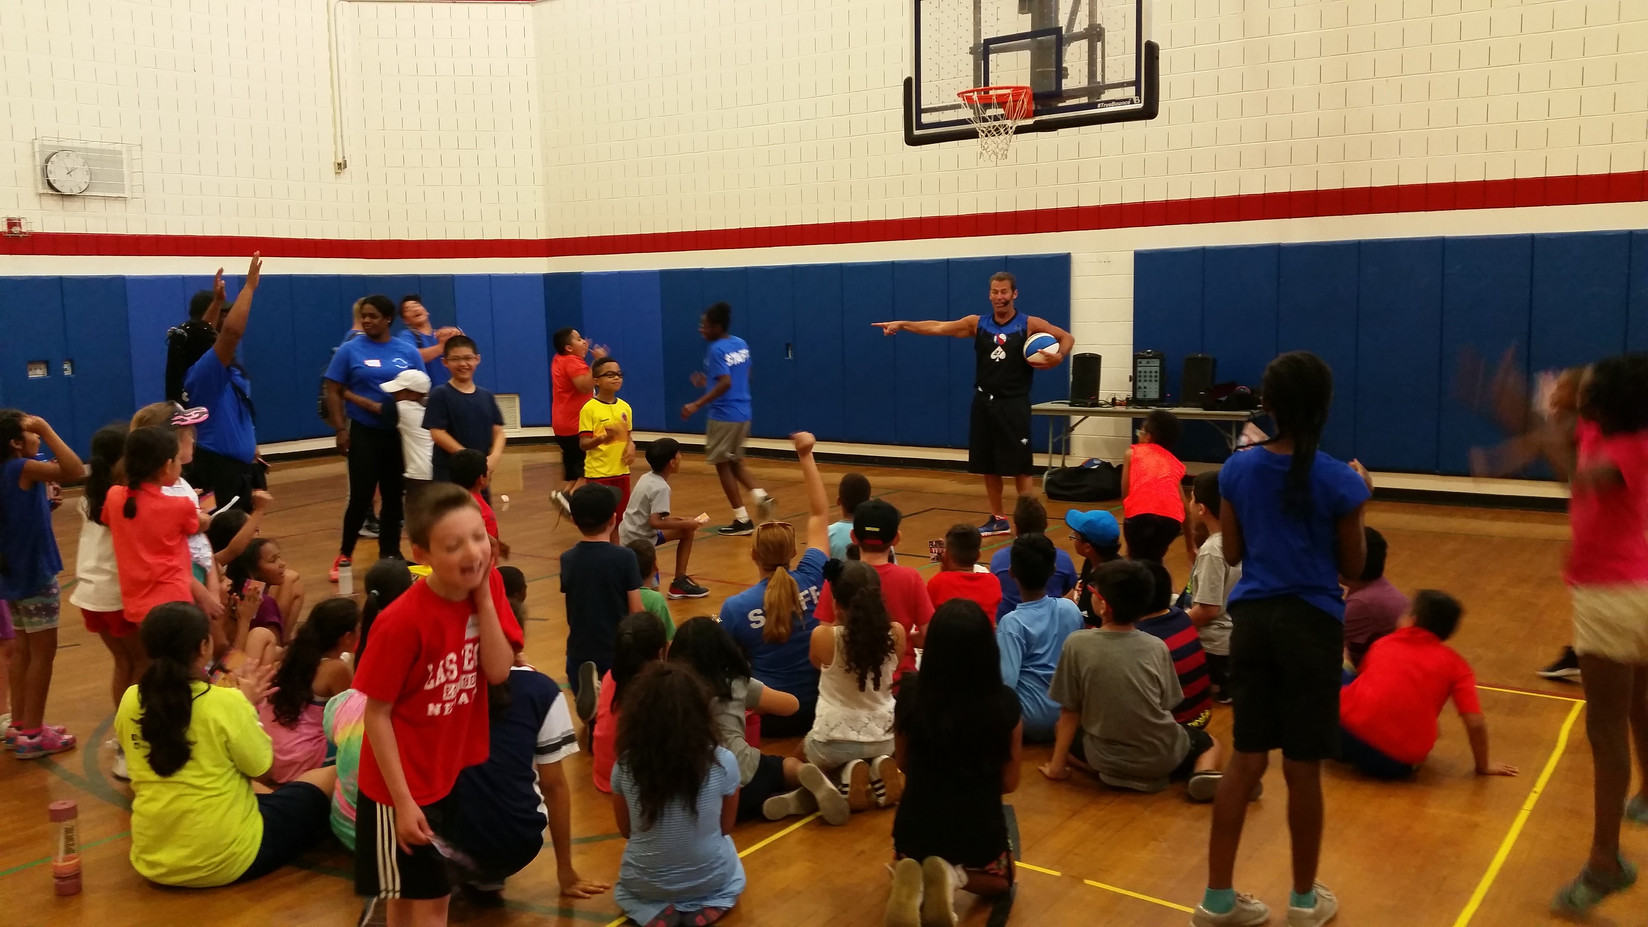 Basketball-Master-With-Kids.jpg